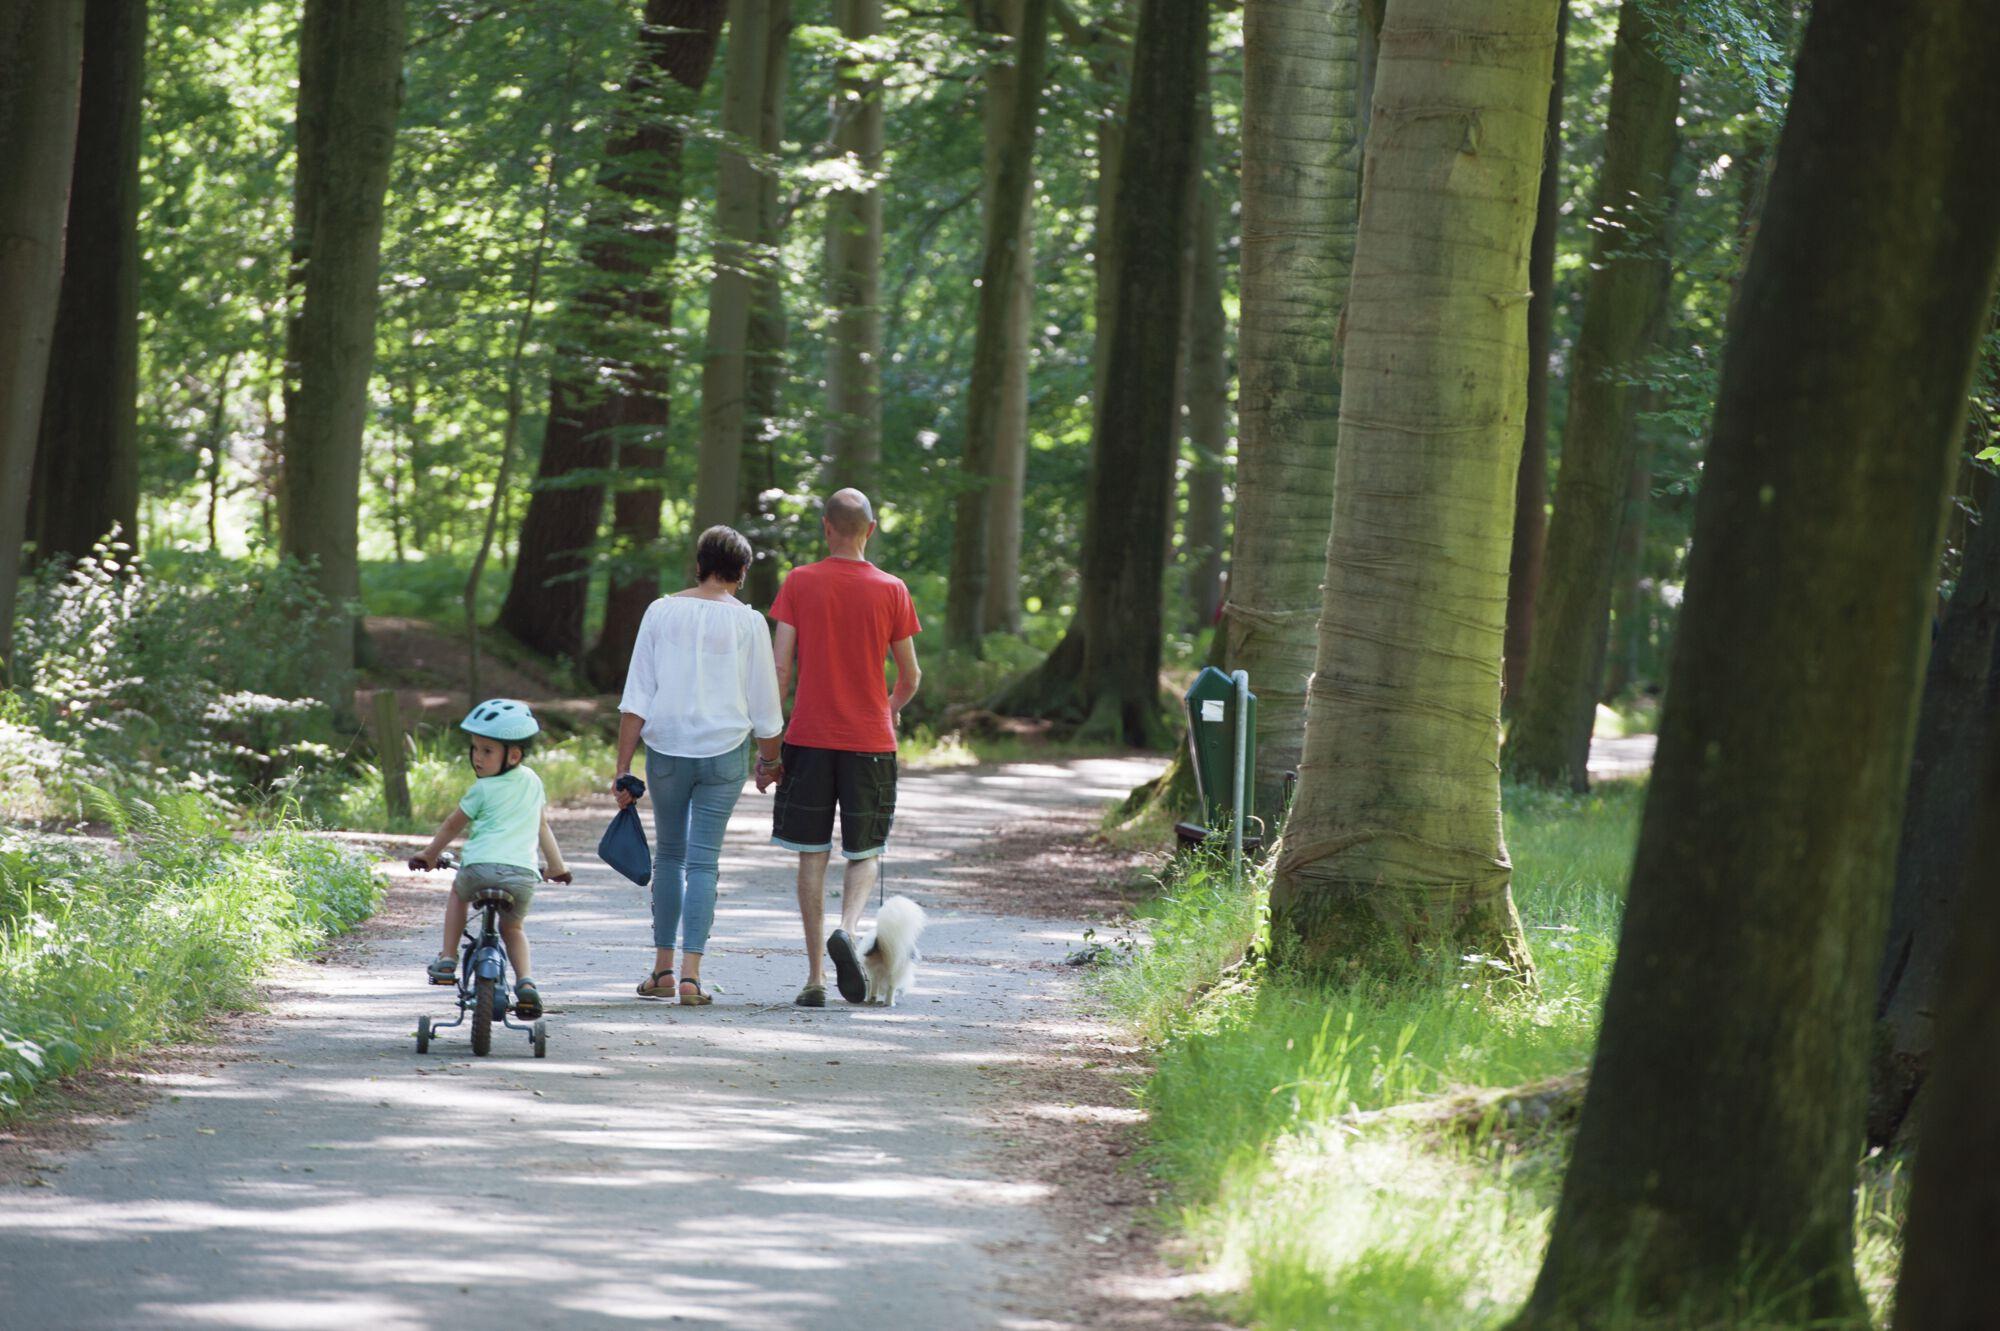 20180701 Speel erop bos Het Leen (43).jpg